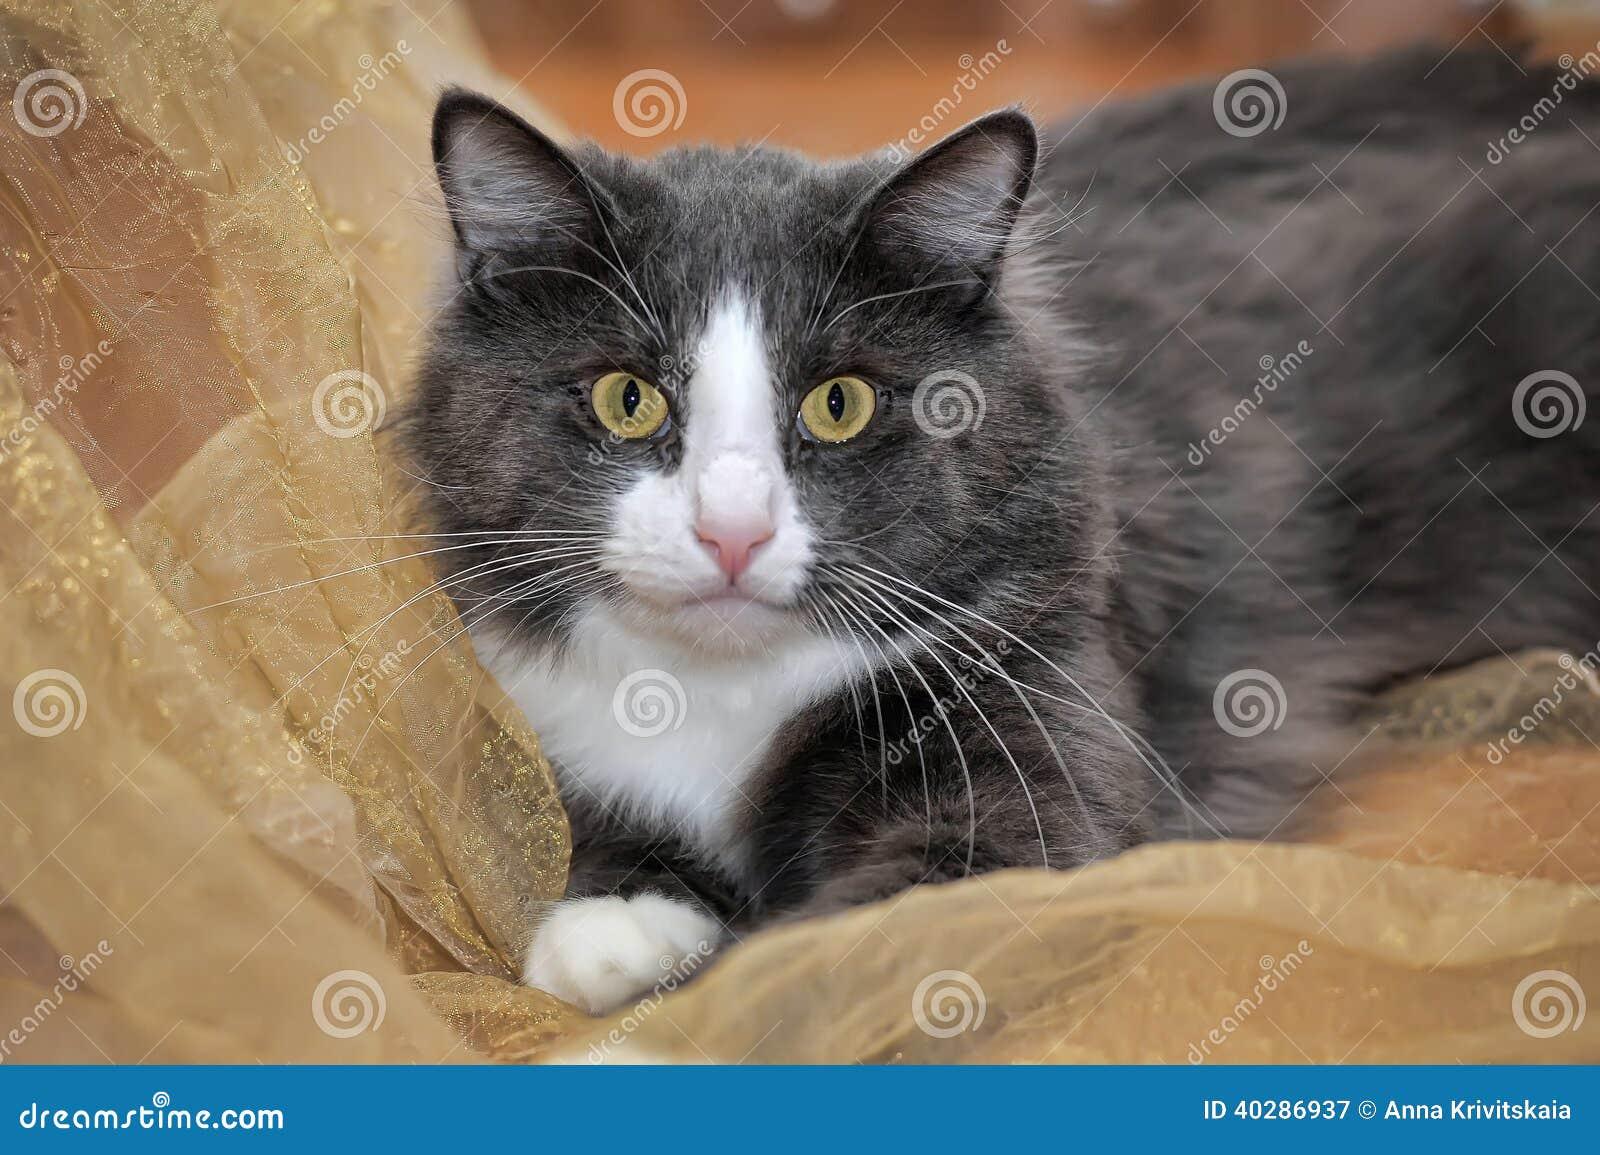 Пушистый серый и белый кот